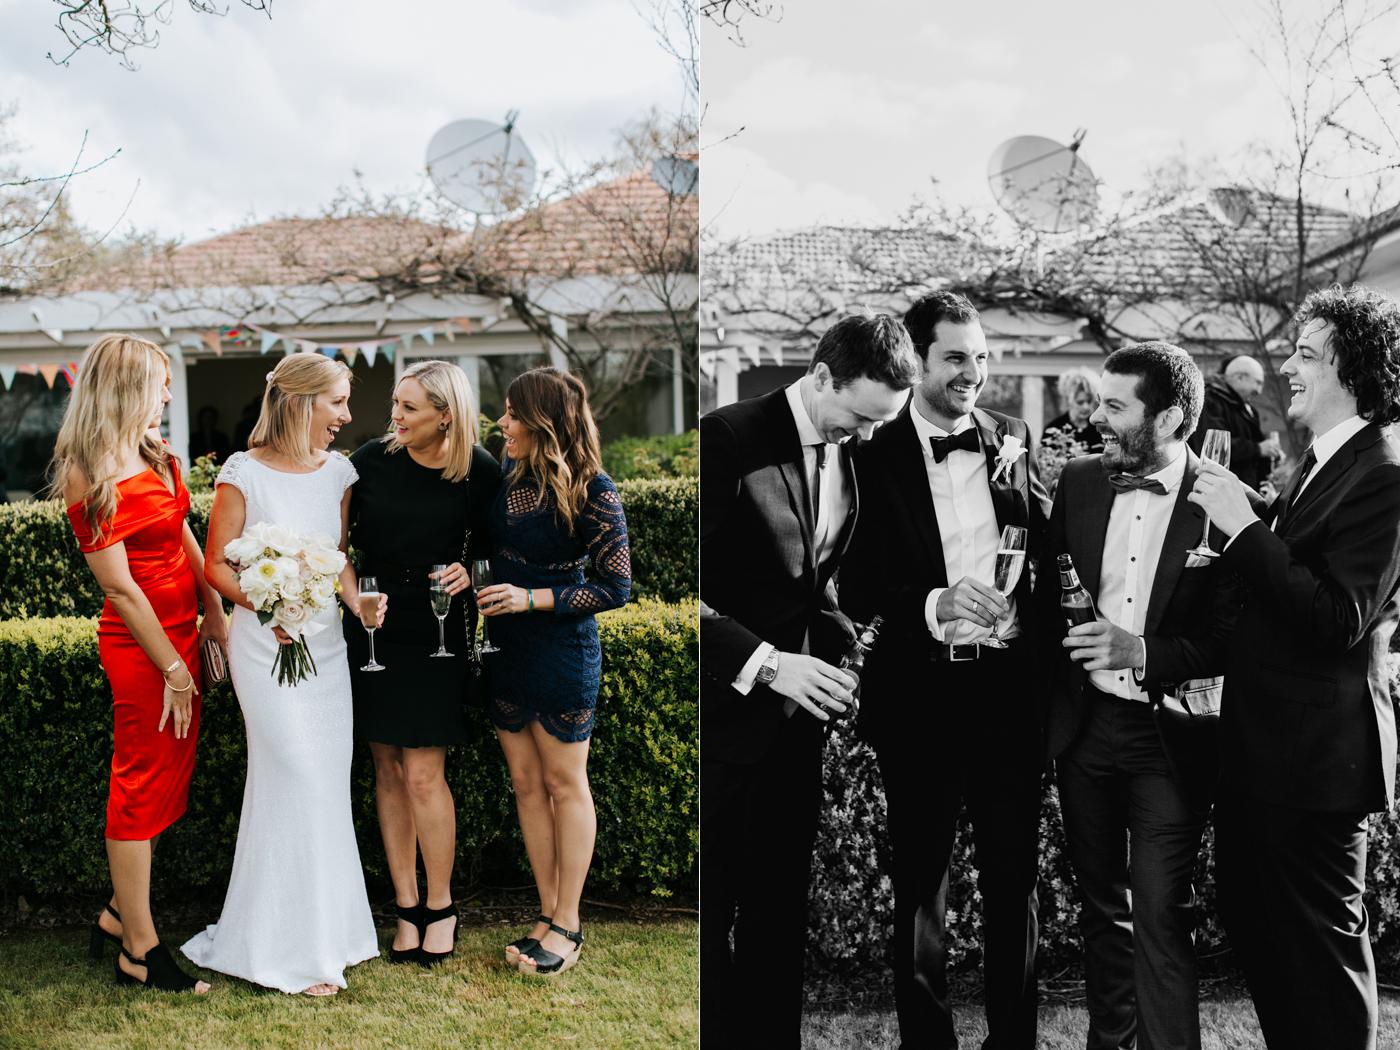 Bridget & James - Orange Country Wedding - Samantha Heather Photography-73.jpg